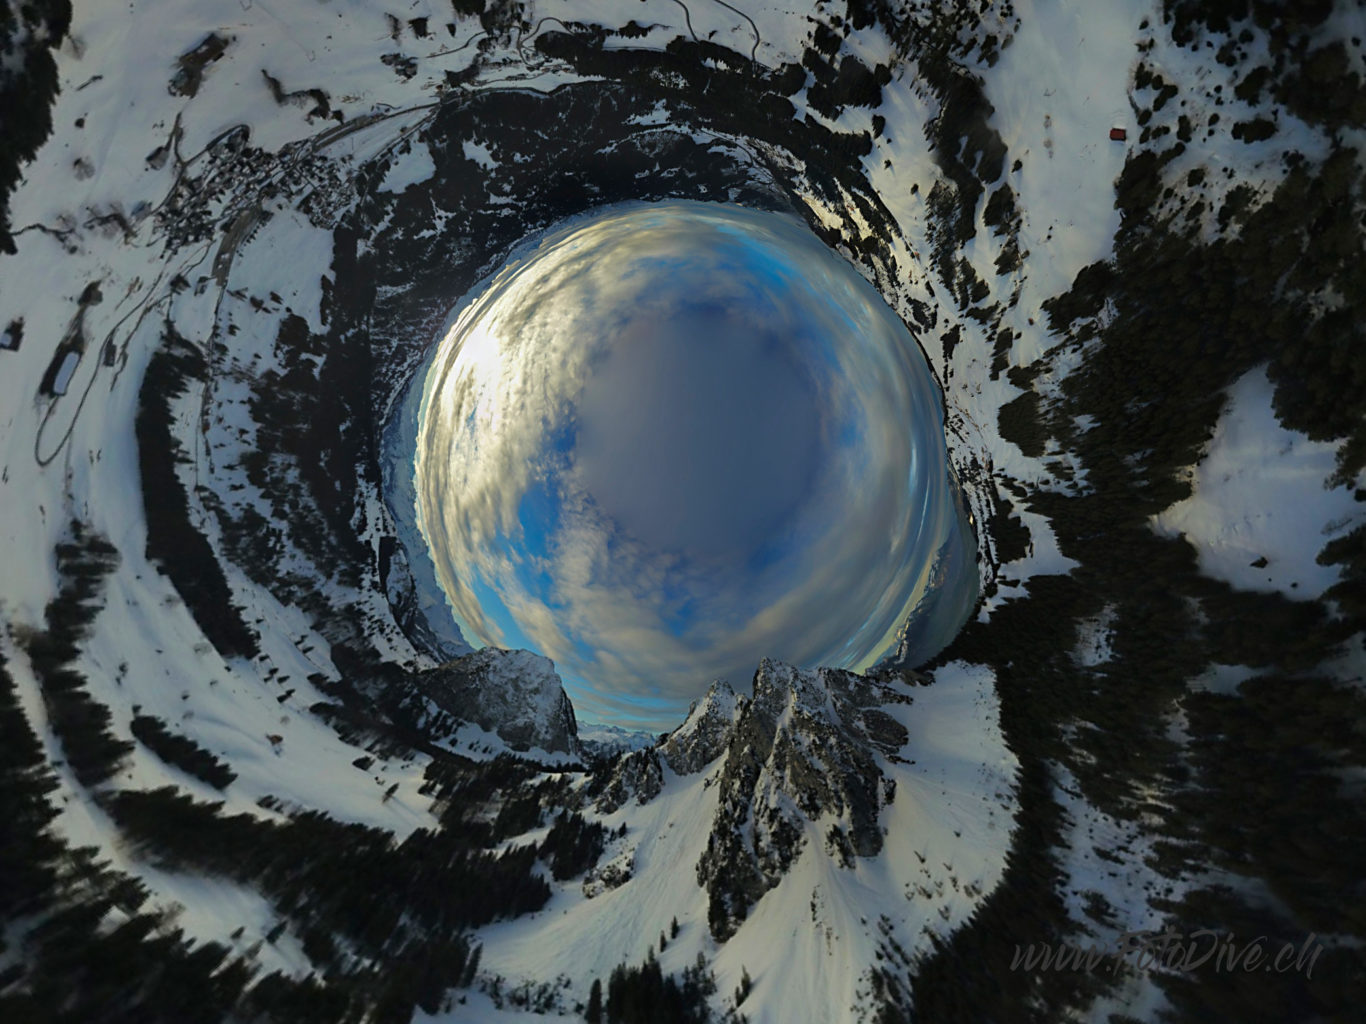 360 Photography, The Mythen Mountain Group, Canton Schwyz - Switzerland